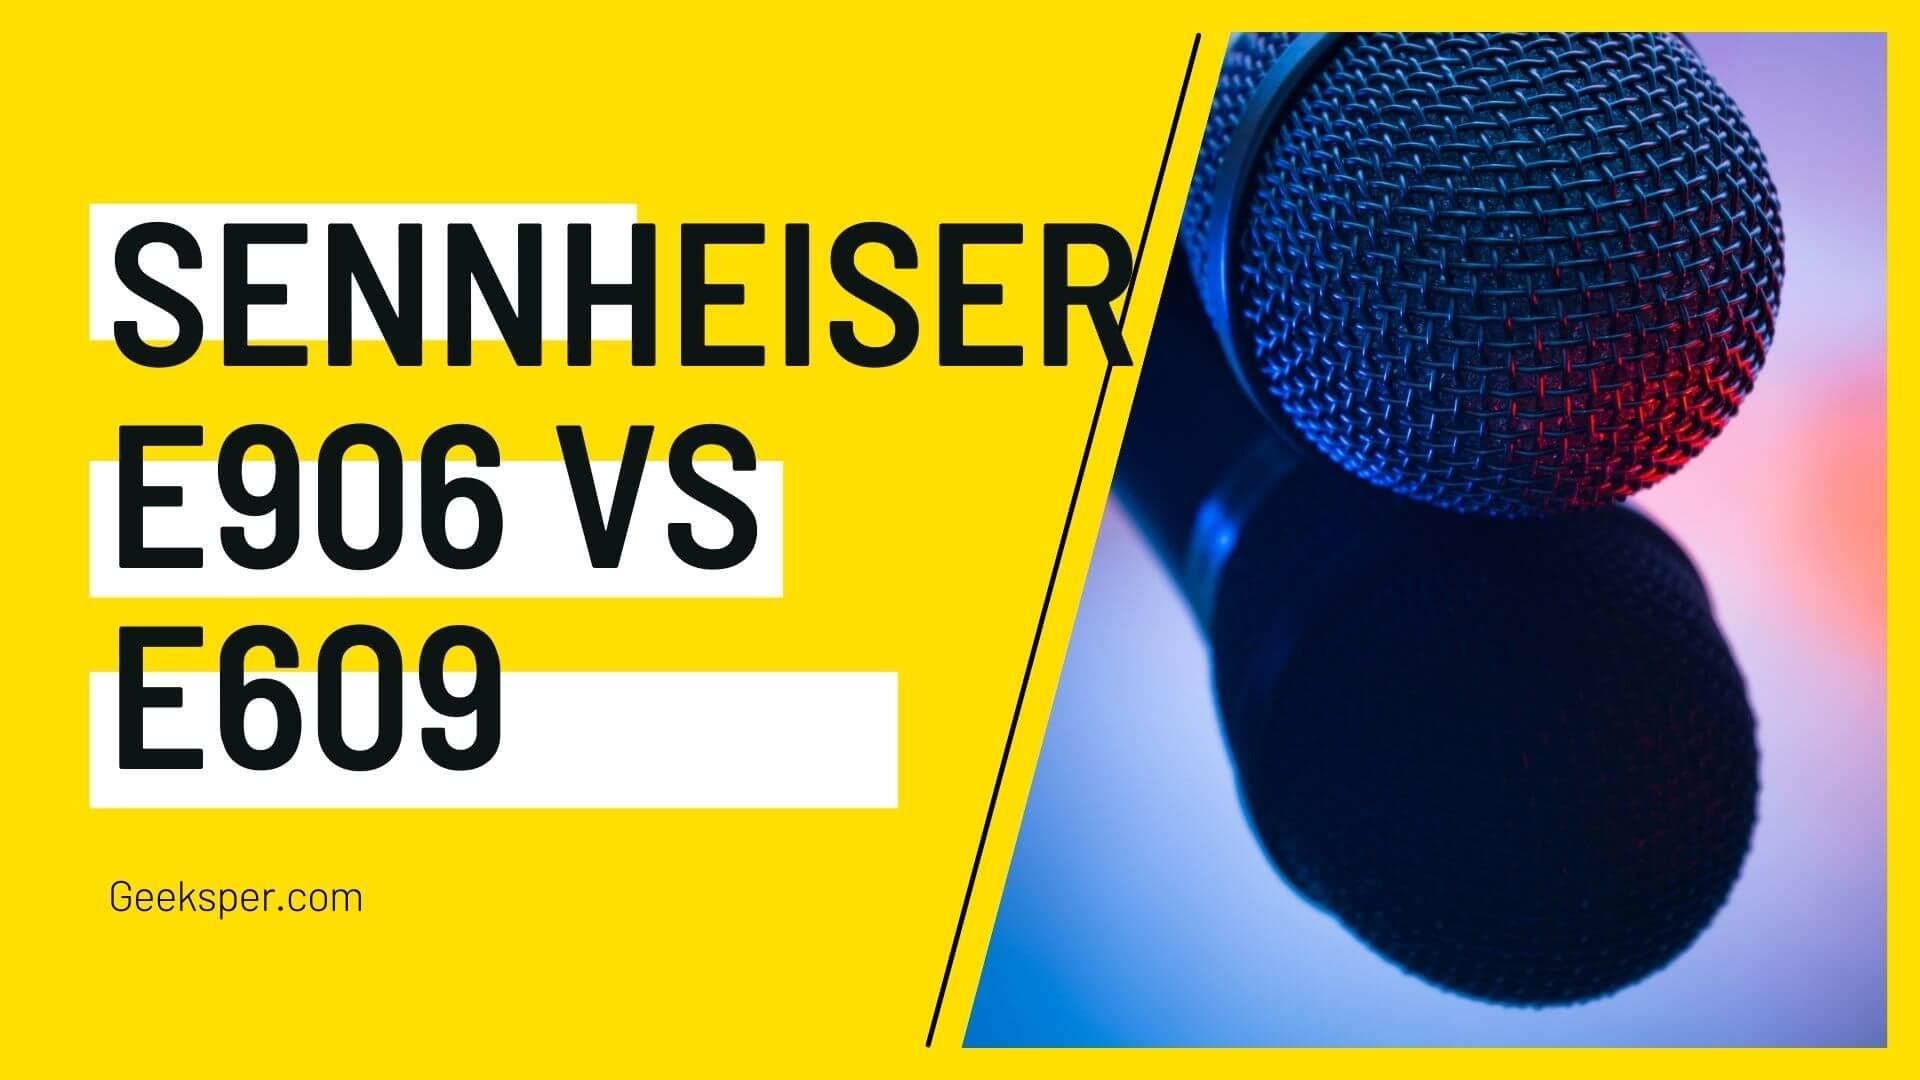 Sennheiser e906 vs e609 Microphone Comparison